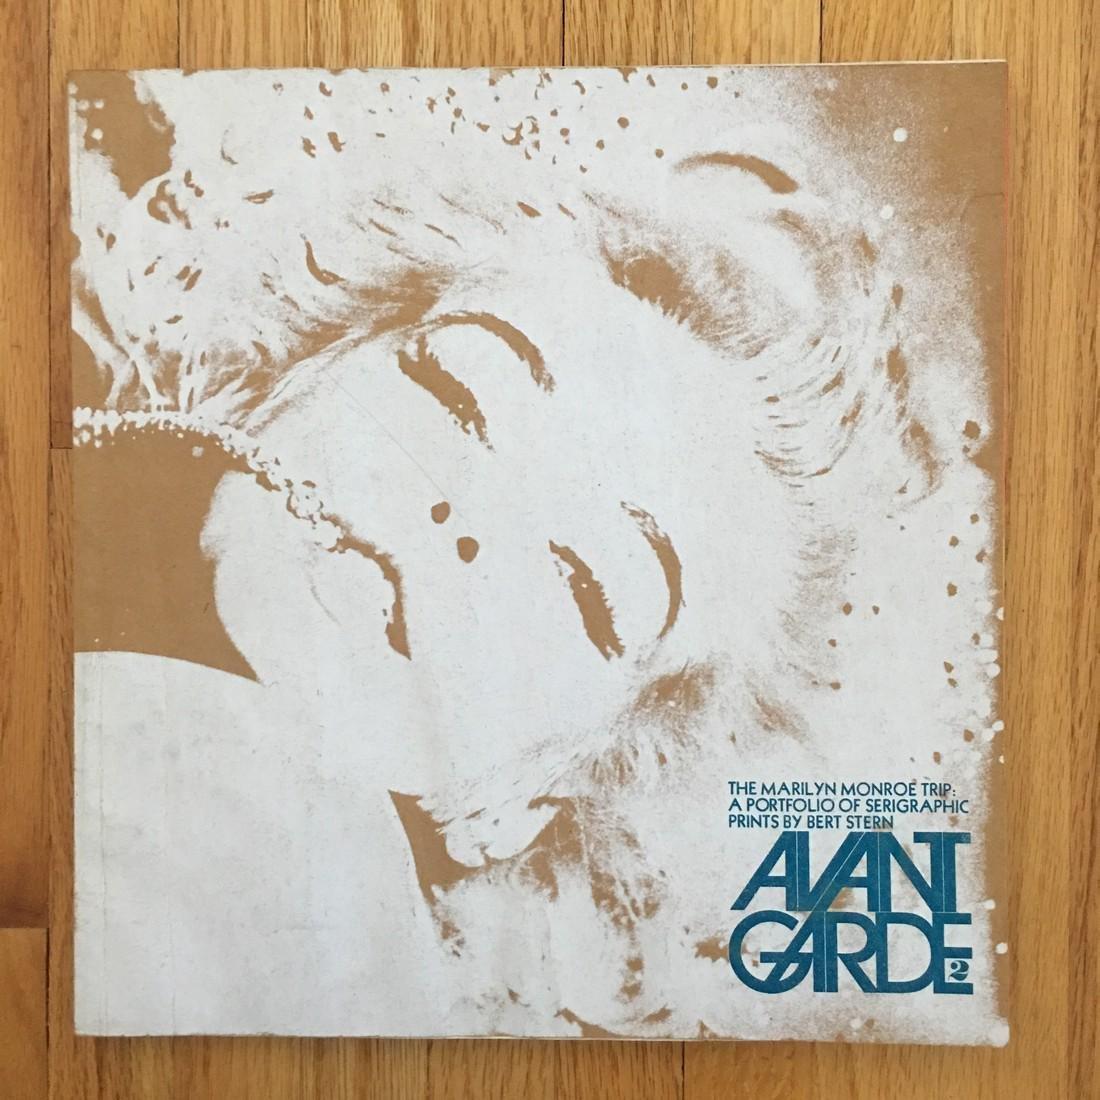 AVANT GARDE #2 - with iconic Marilyn Monroe Serigraphs